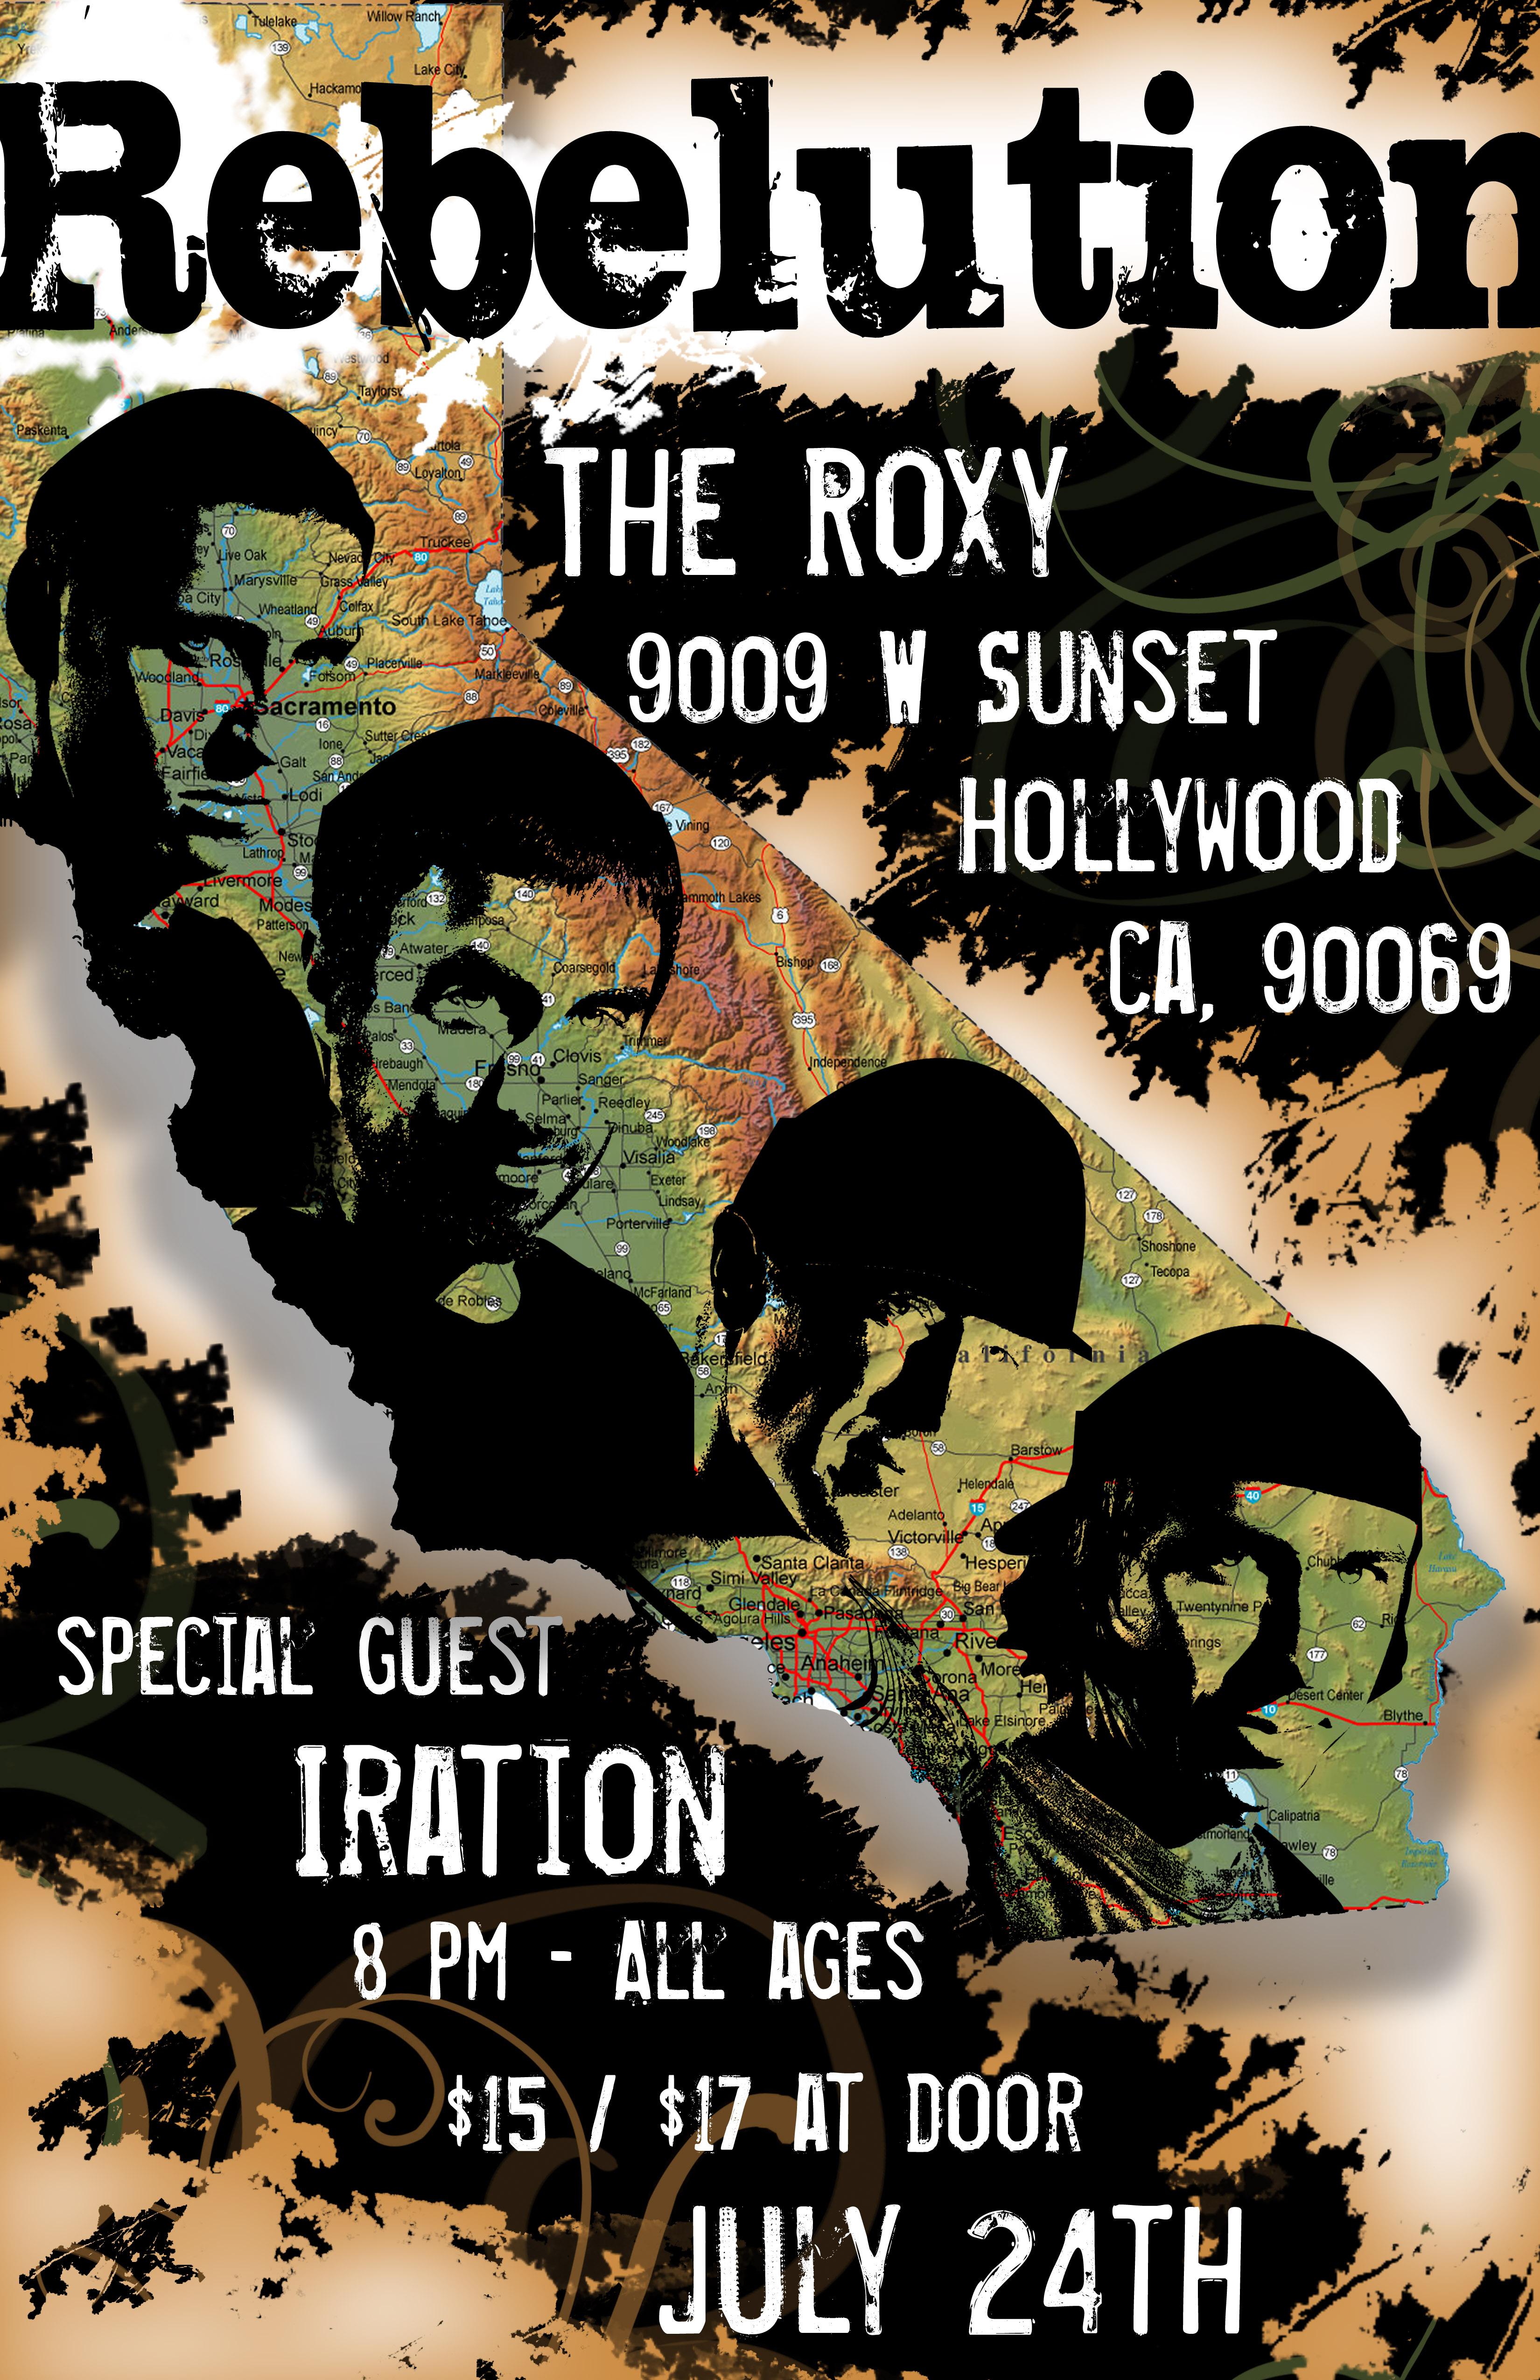 Rebelution Concert Poster By Rkaponm On Deviantart